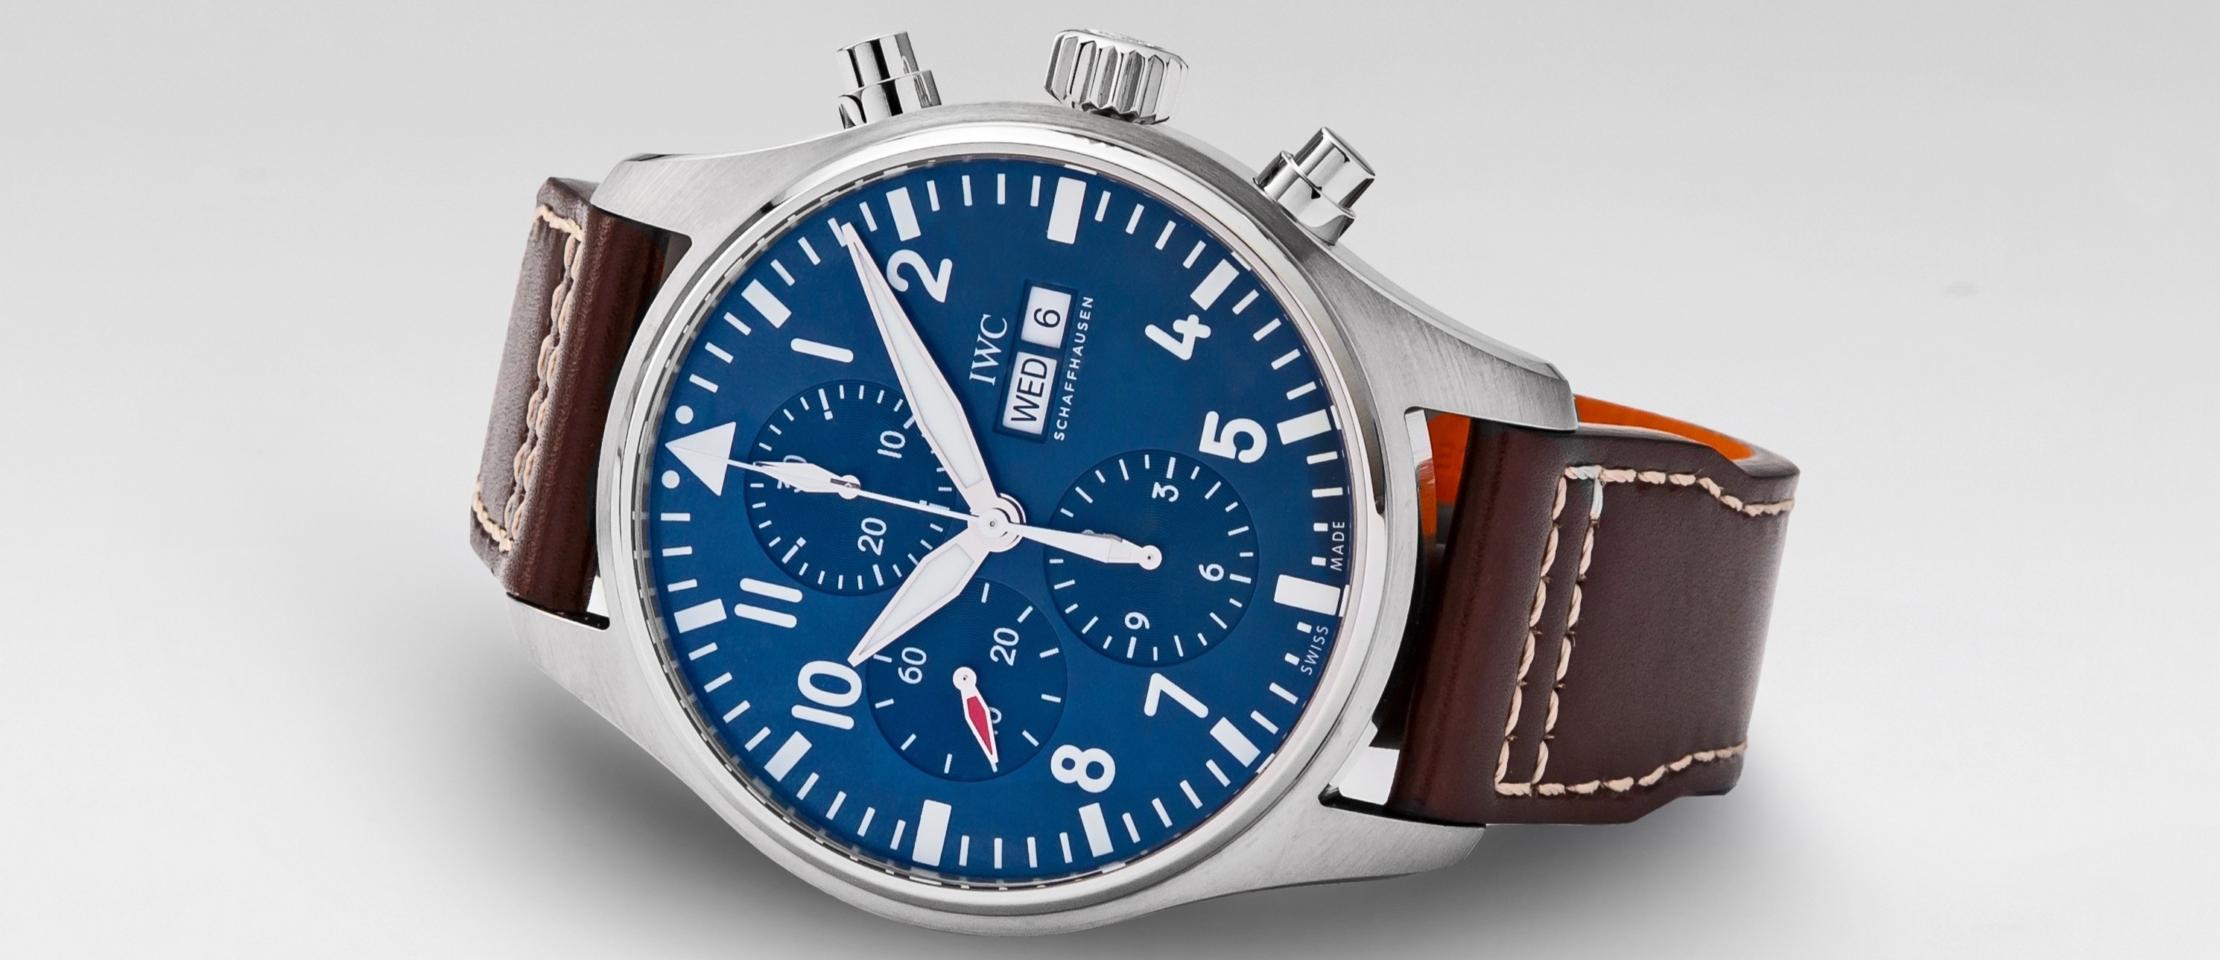 More current than ever: The iconic chronograph caliber ETA Valjoux 7750